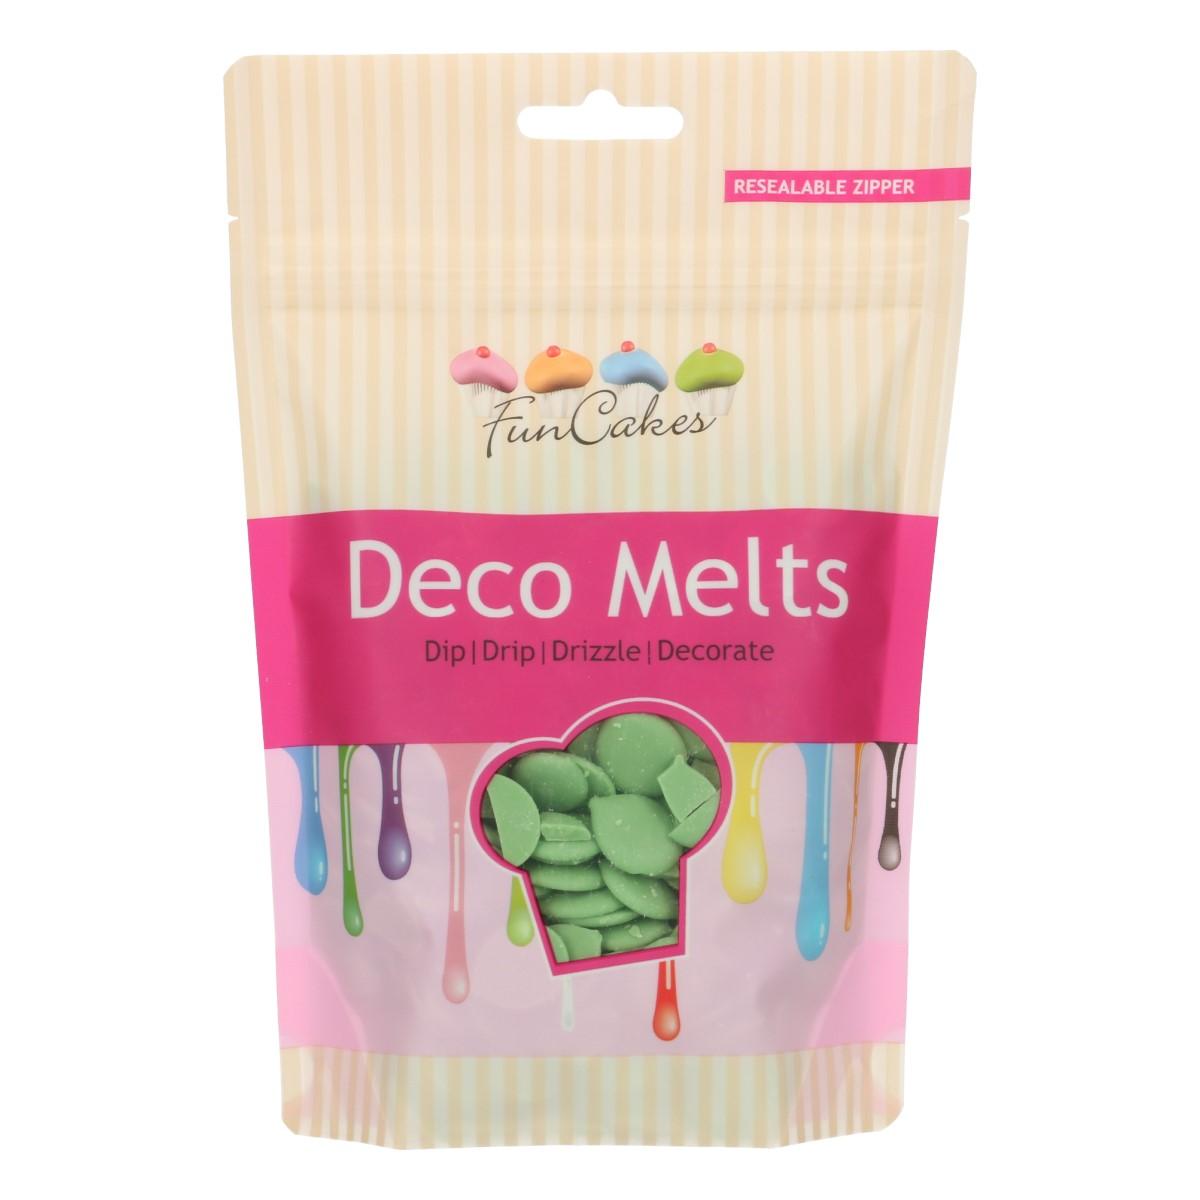 Imagen de producto: https://tienda.postreadiccion.com/img/articulos/secundarias12794-deco-melts-verdes-250-g-funcakes-1.jpg